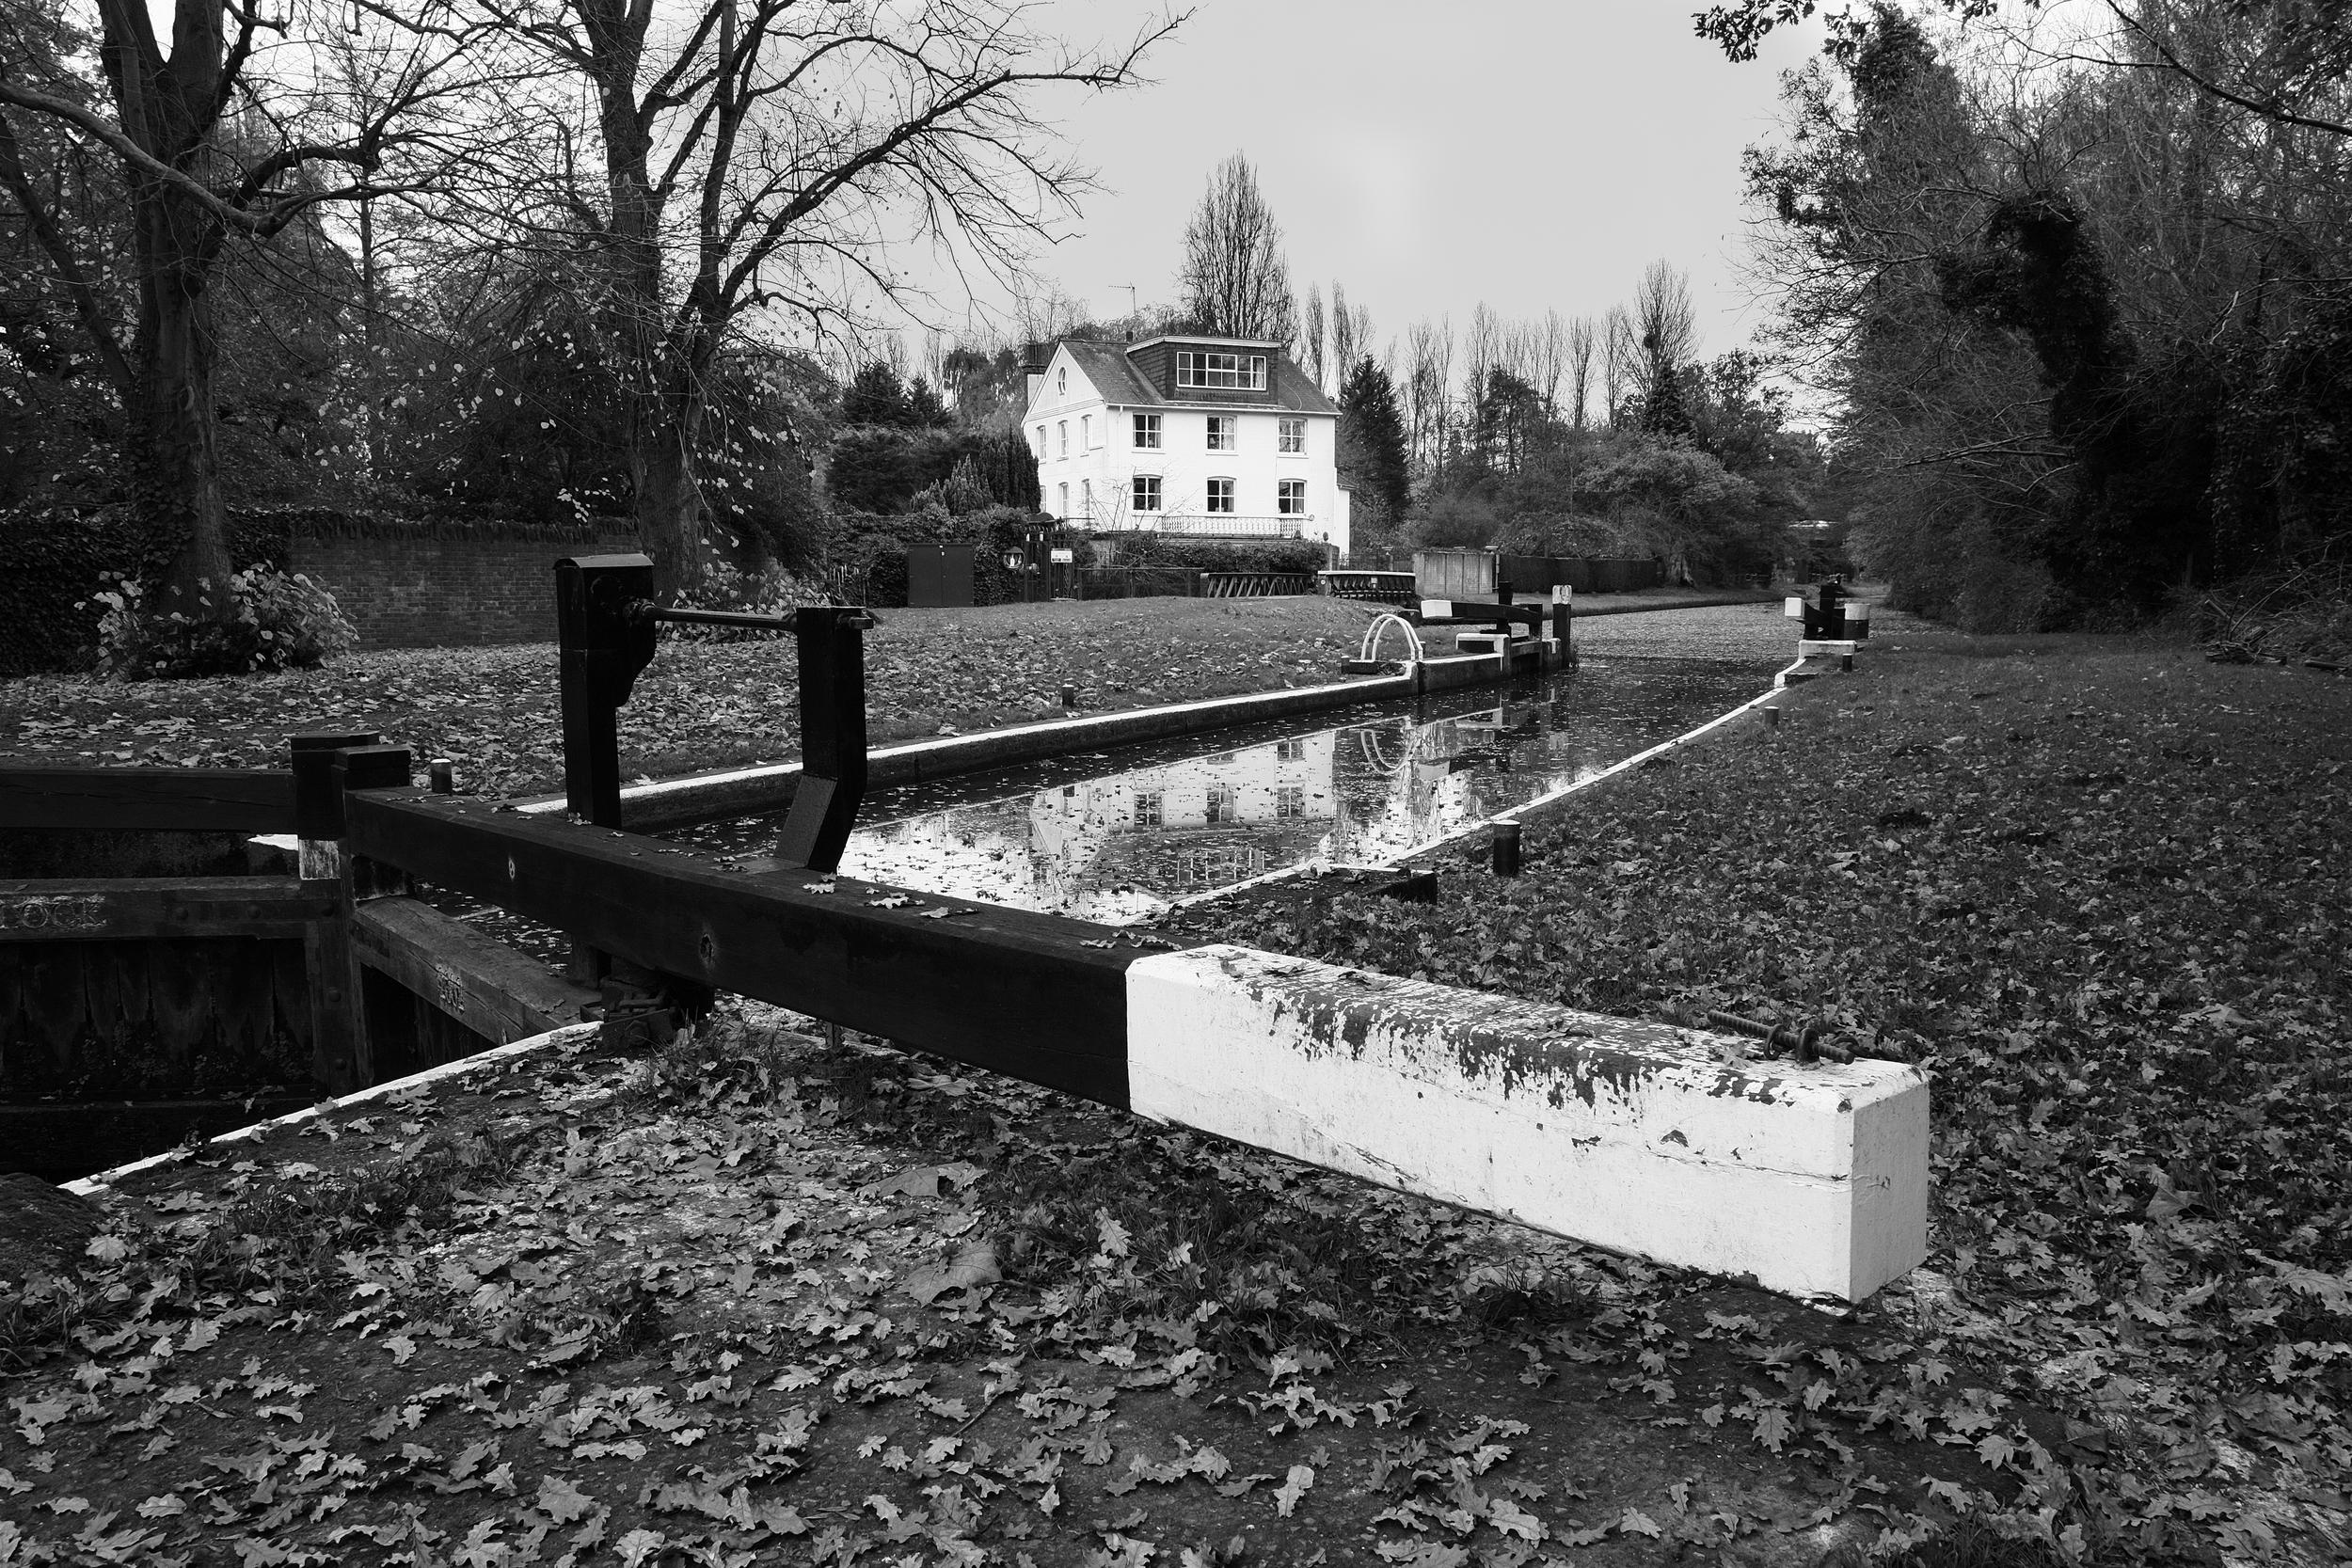 Bowers Lock